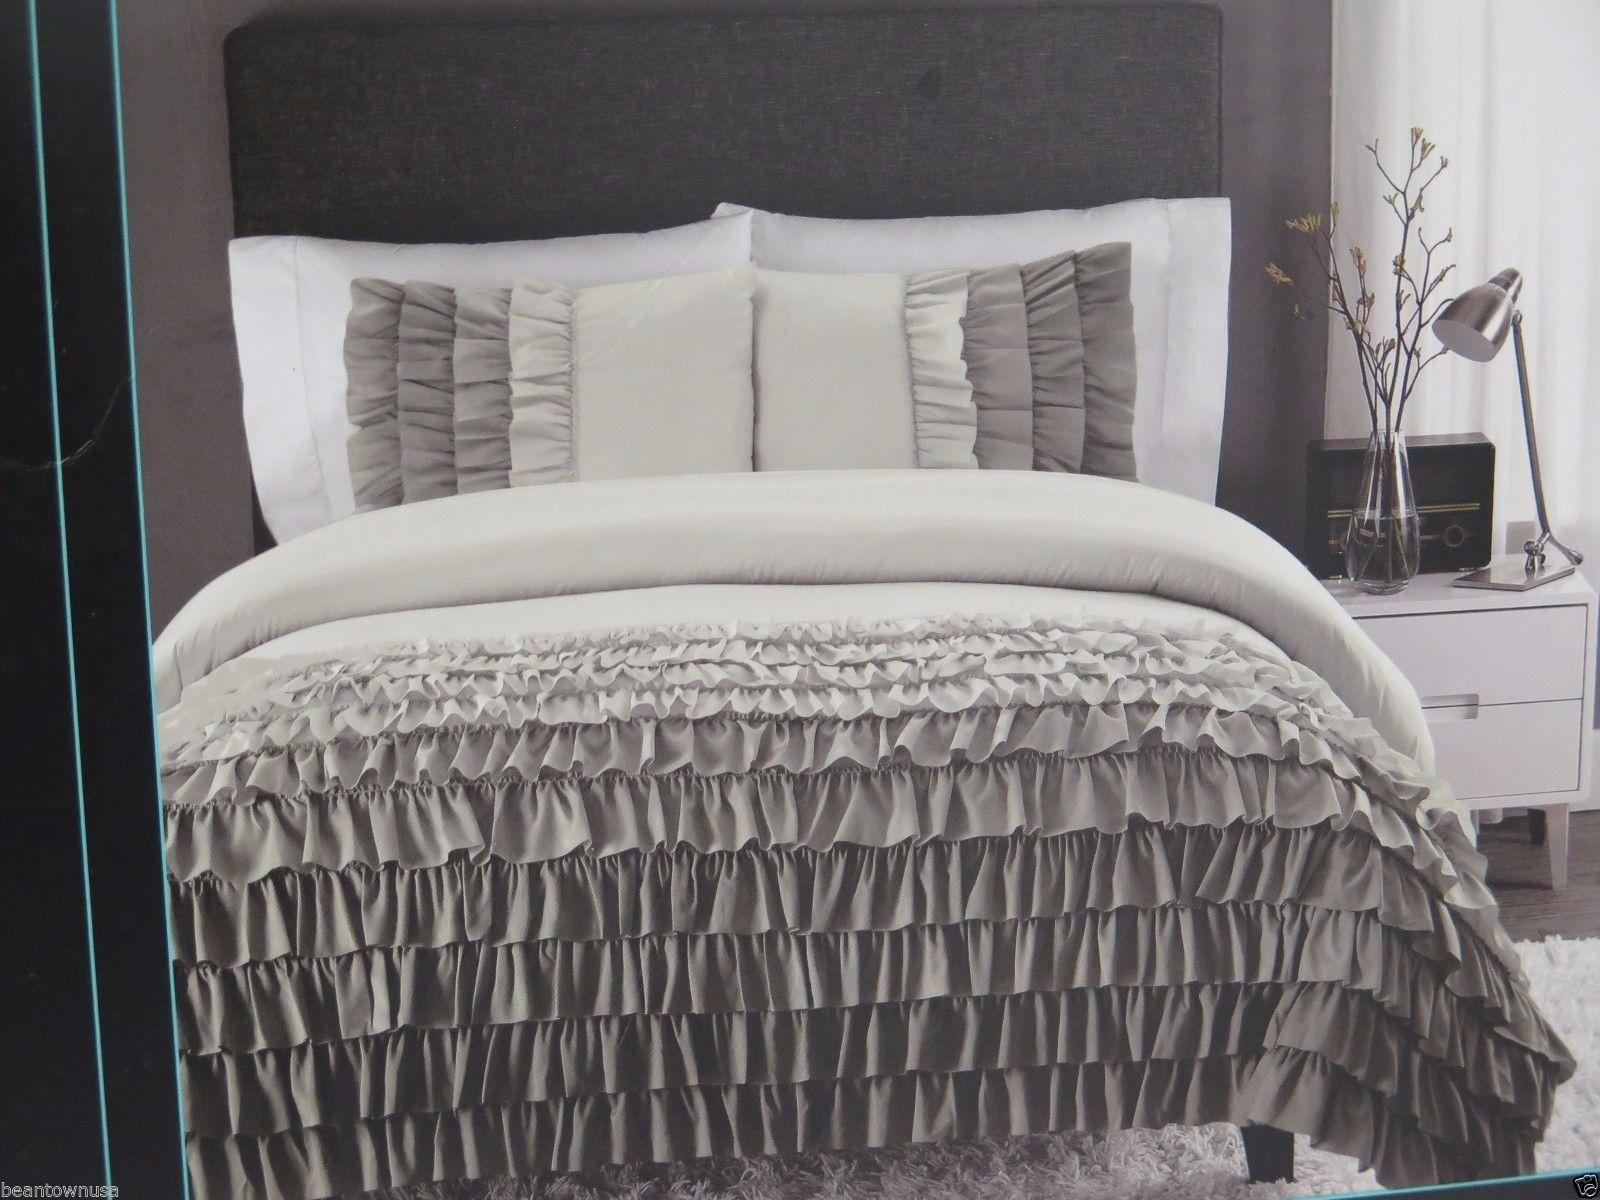 Cynthia Rowley Gray Ombre Ruffled Comforter Sham Set Twin Twin XL 2 PC | eBay